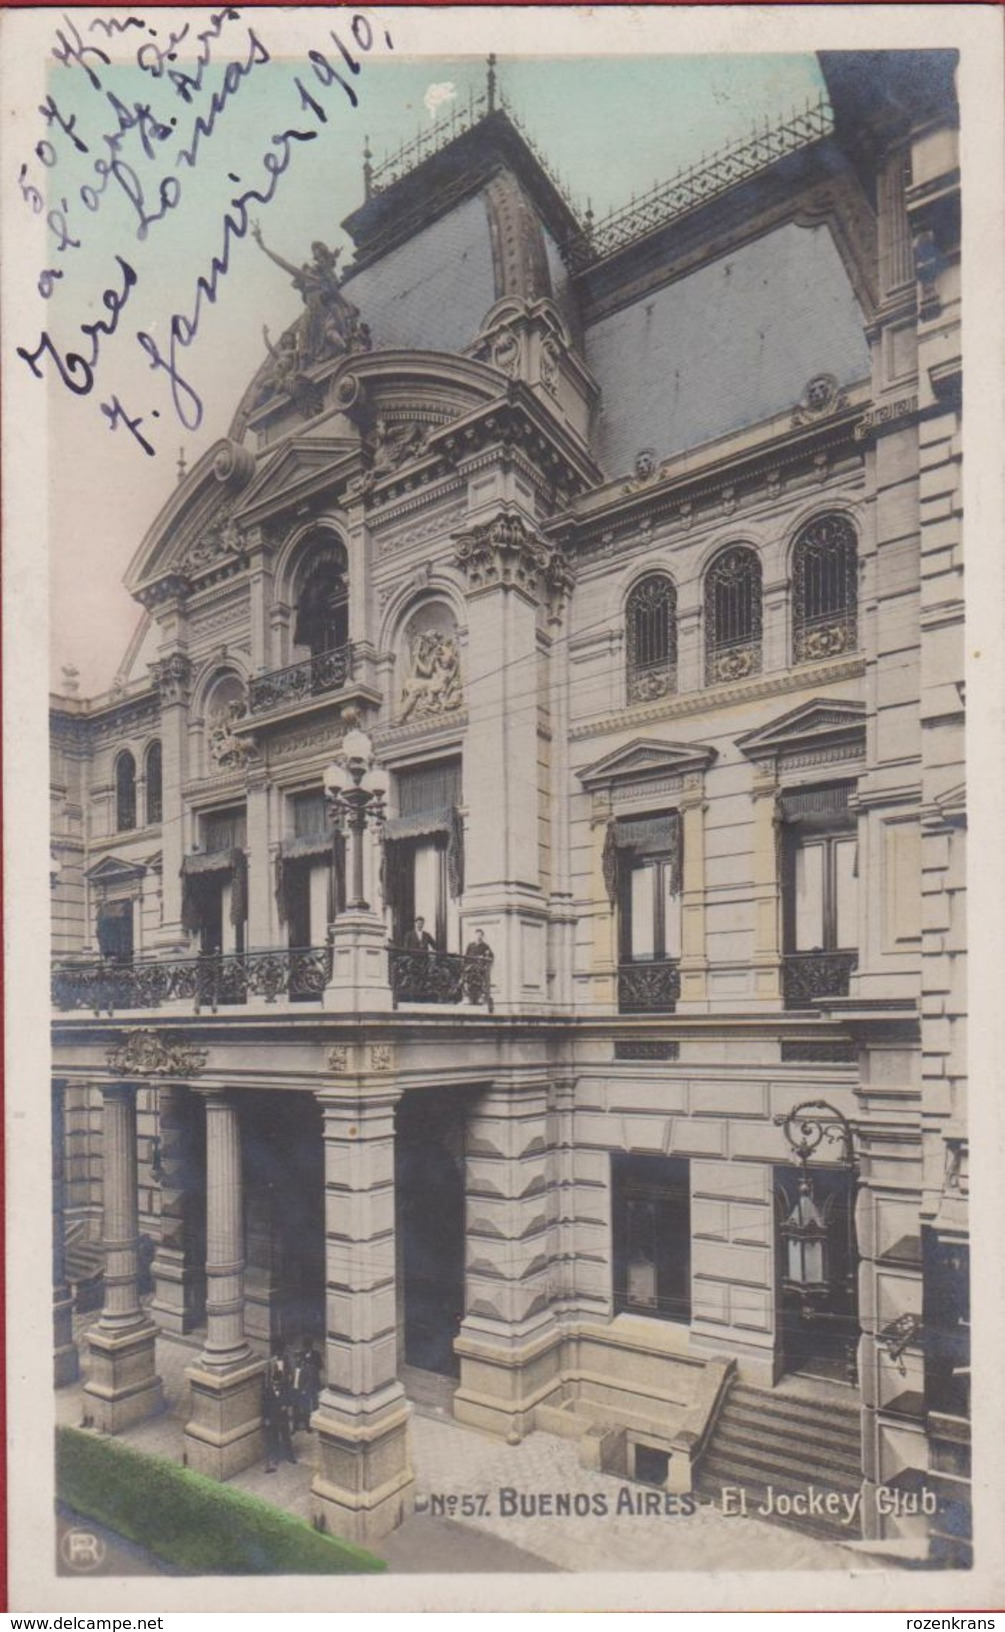 Argentina Argentine El Jockey Club Fotokaart Photo Card 1910 (In Very Good Condition) Chromatography Argentinie - Argentine